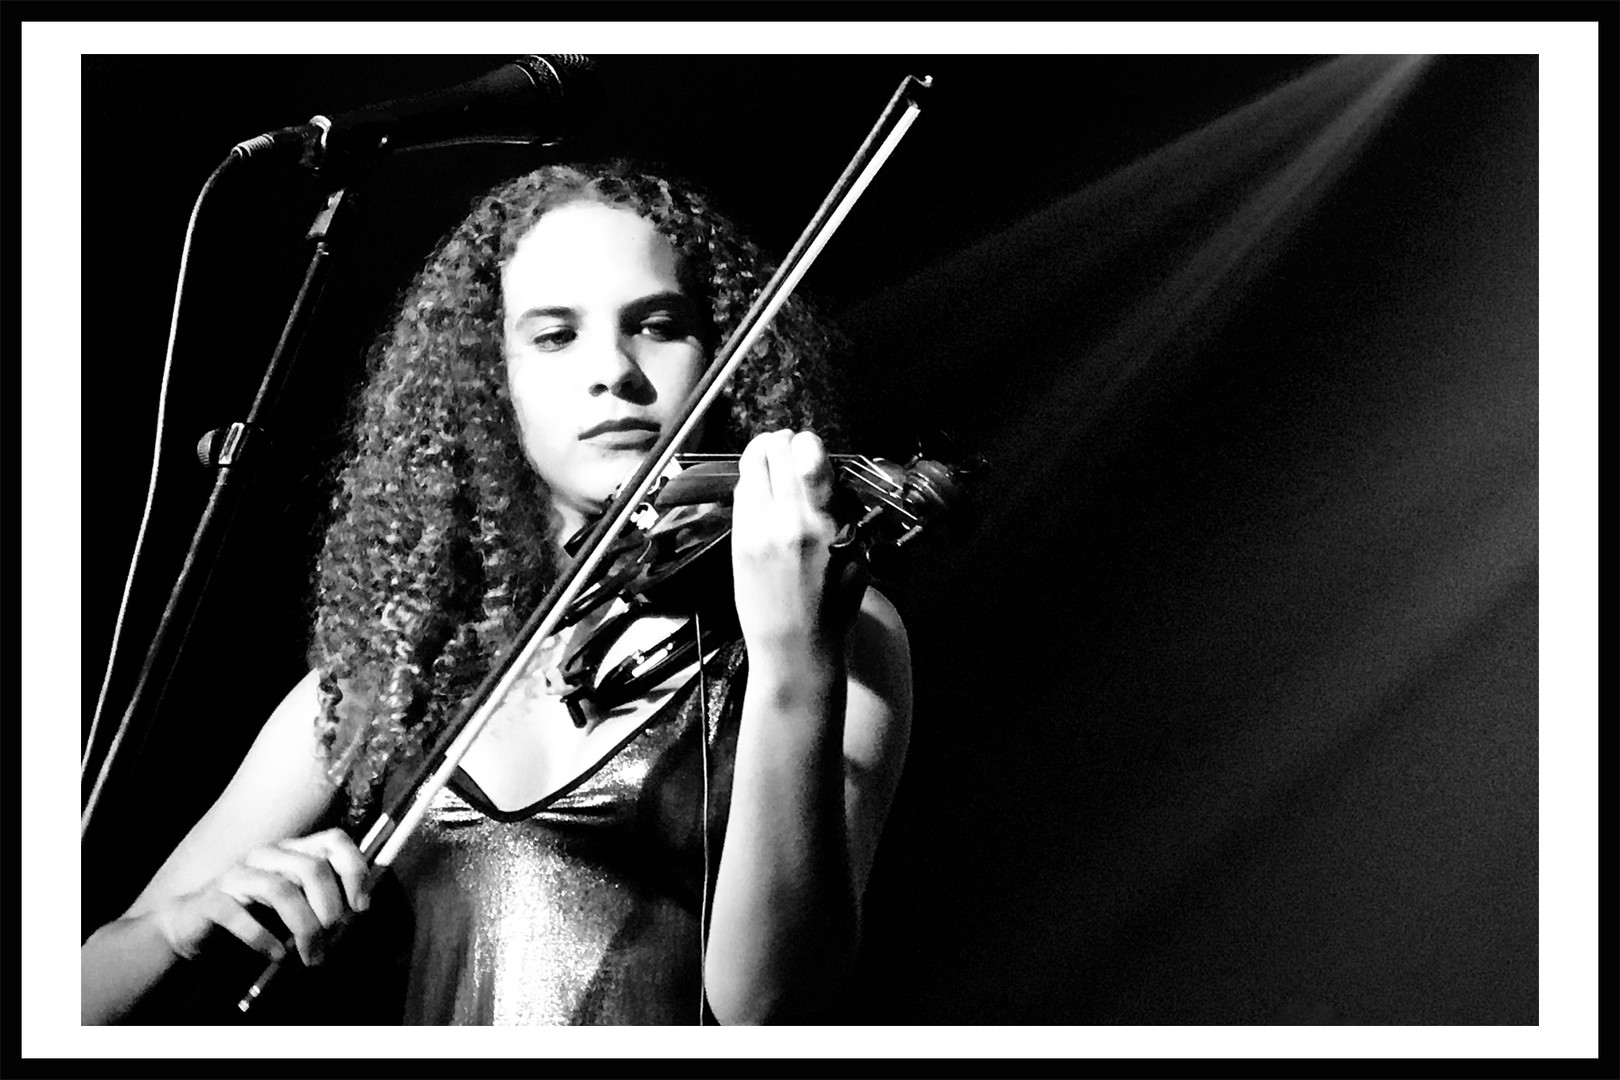 Strings of Cuba